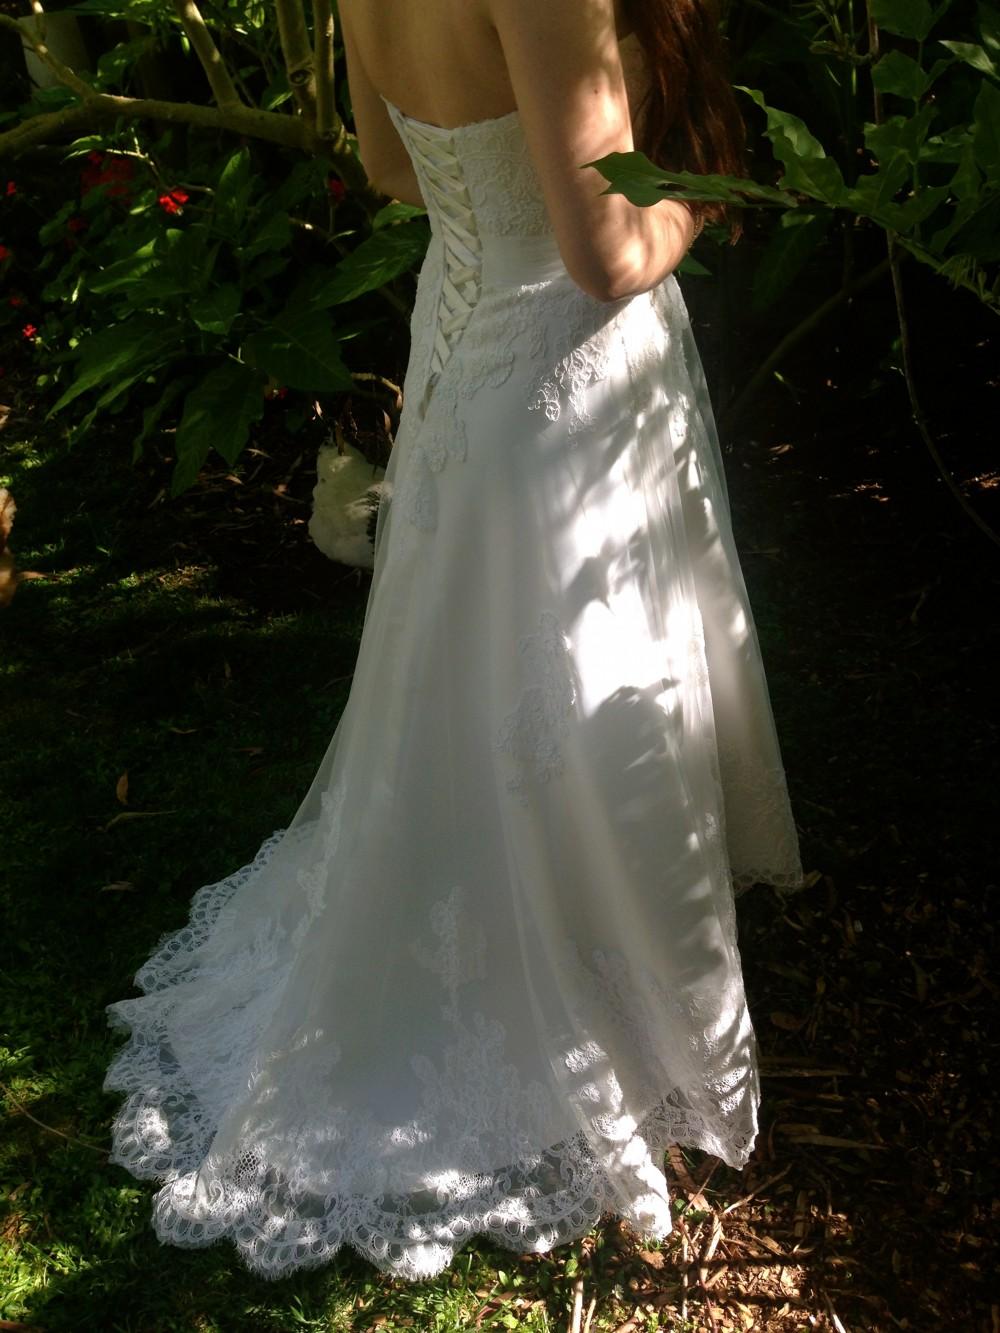 Sell Wedding Dress Quickly - Flower Girl Dresses